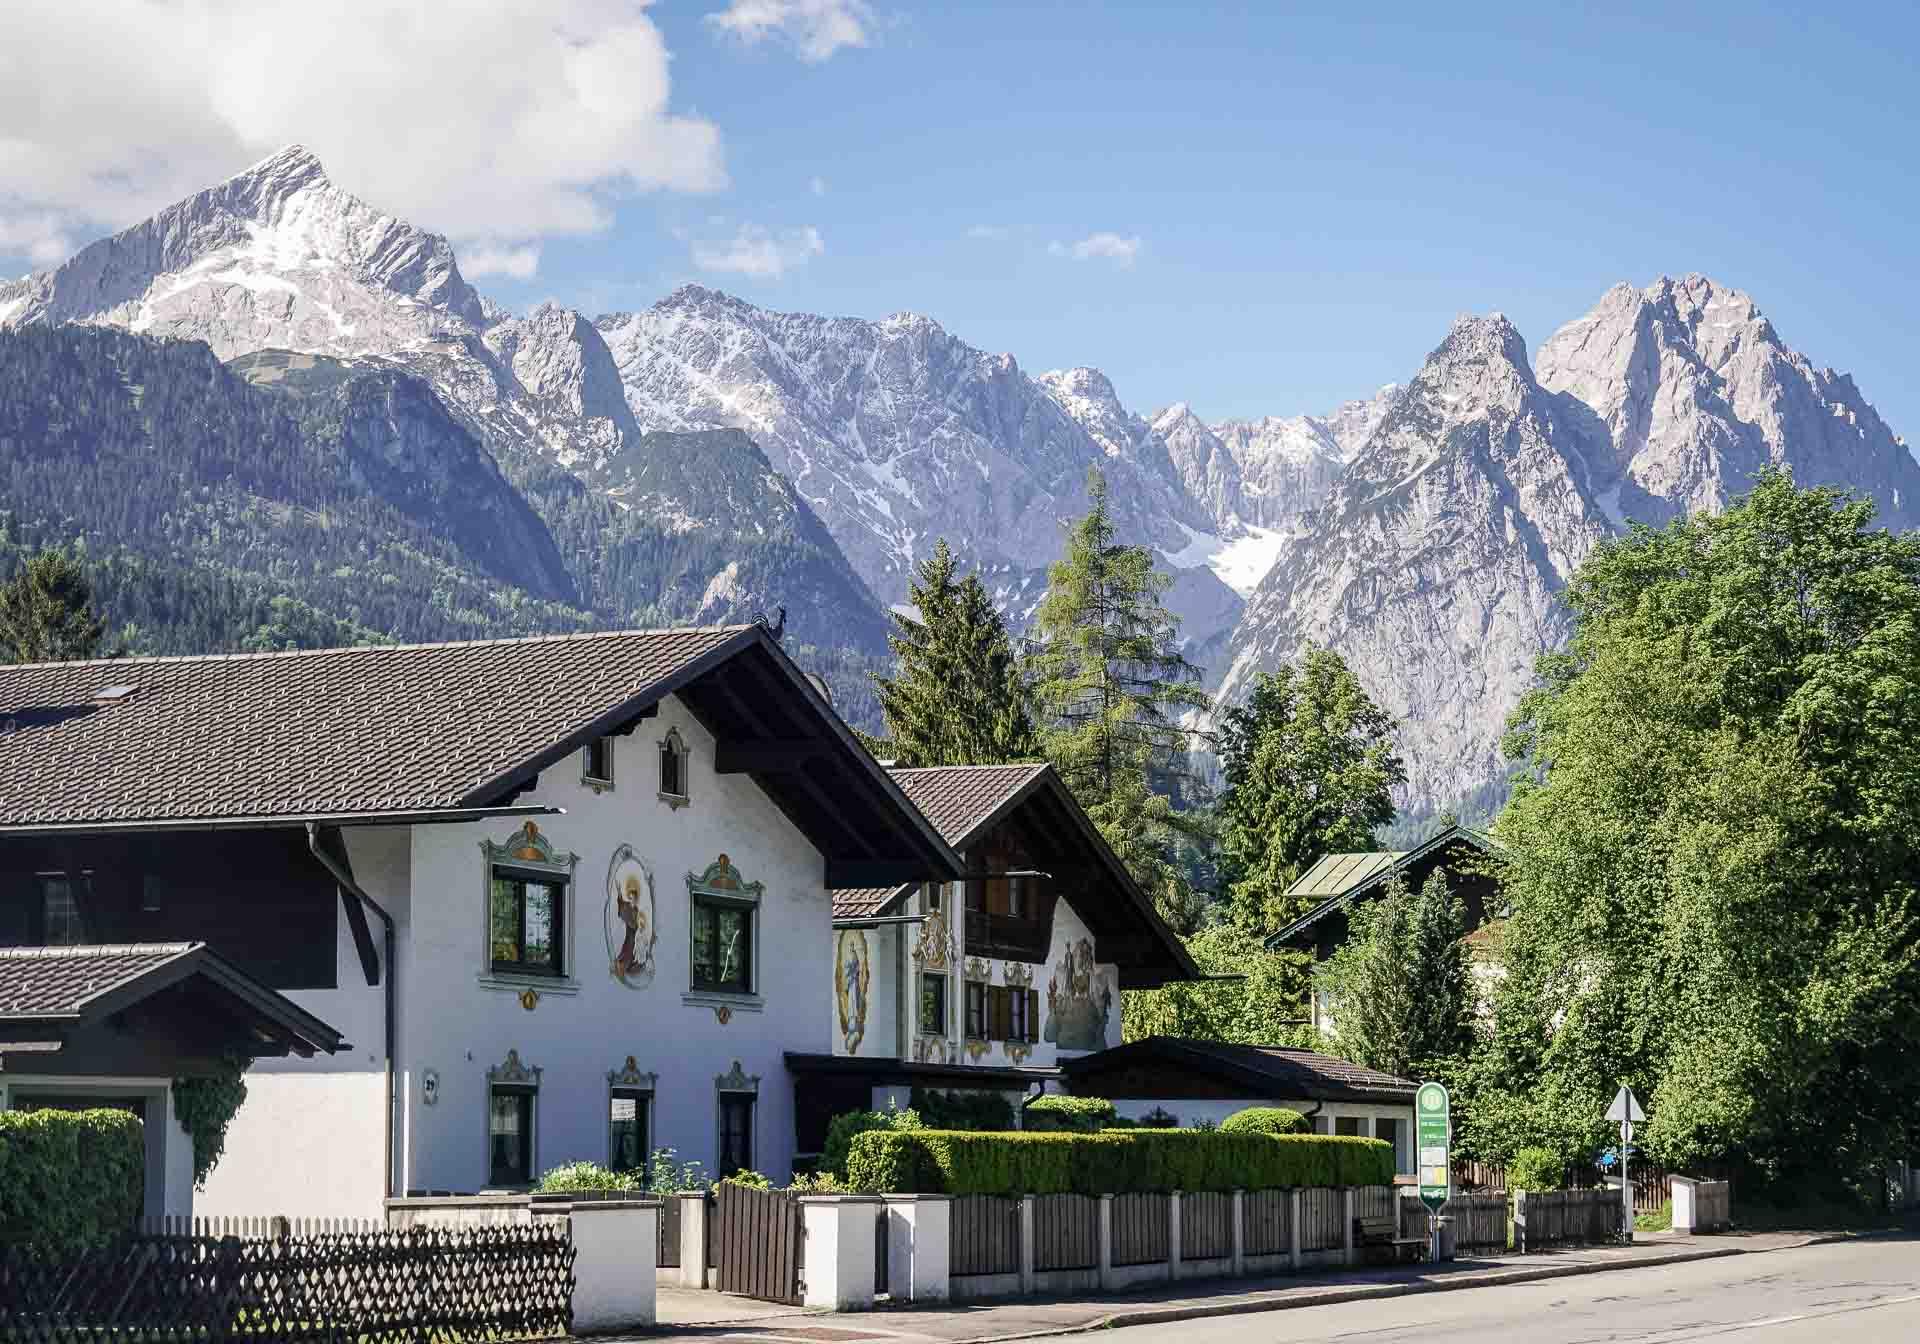 Quartier-Lodge-Garmisch-Partenkirchen-Aussicht